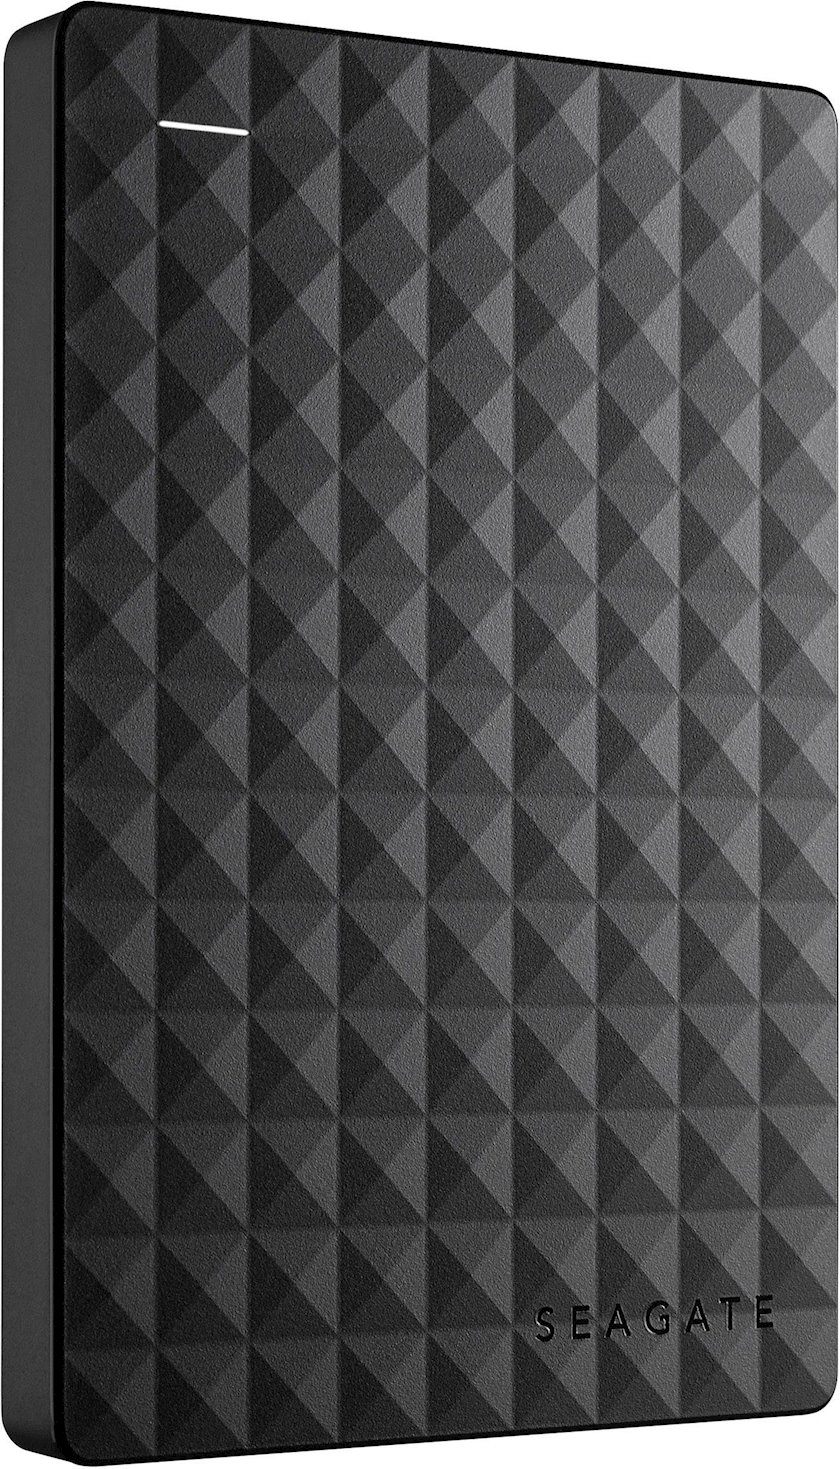 Xarici sərt disk Seagate Expansion Portable 4TB Black